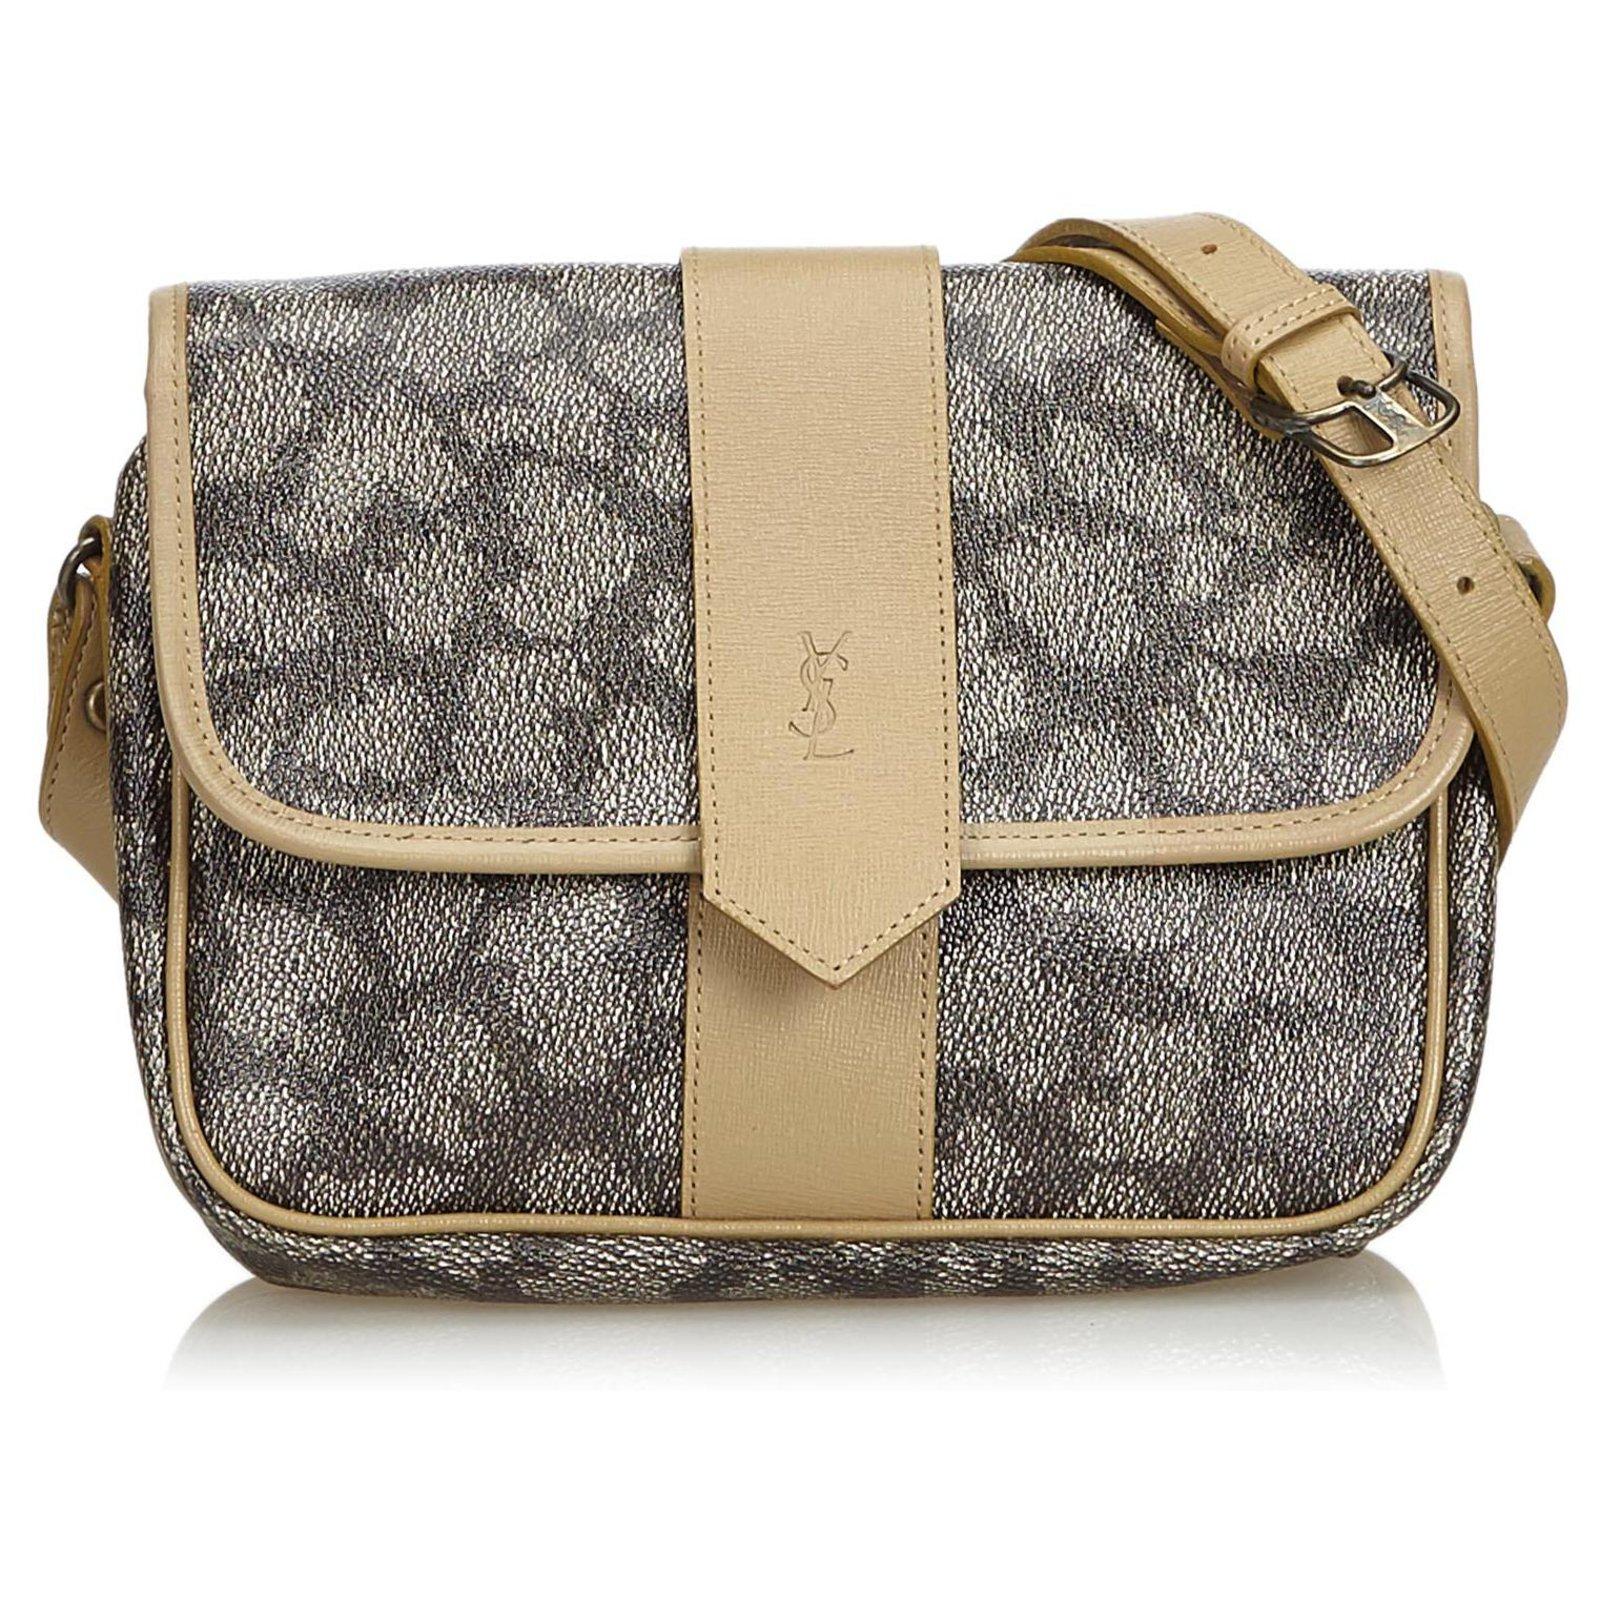 af1fd7a013b Yves Saint Laurent YSL Brown Coated Canvas Crossbody Bag Handbags  Leather,Other,Cloth,